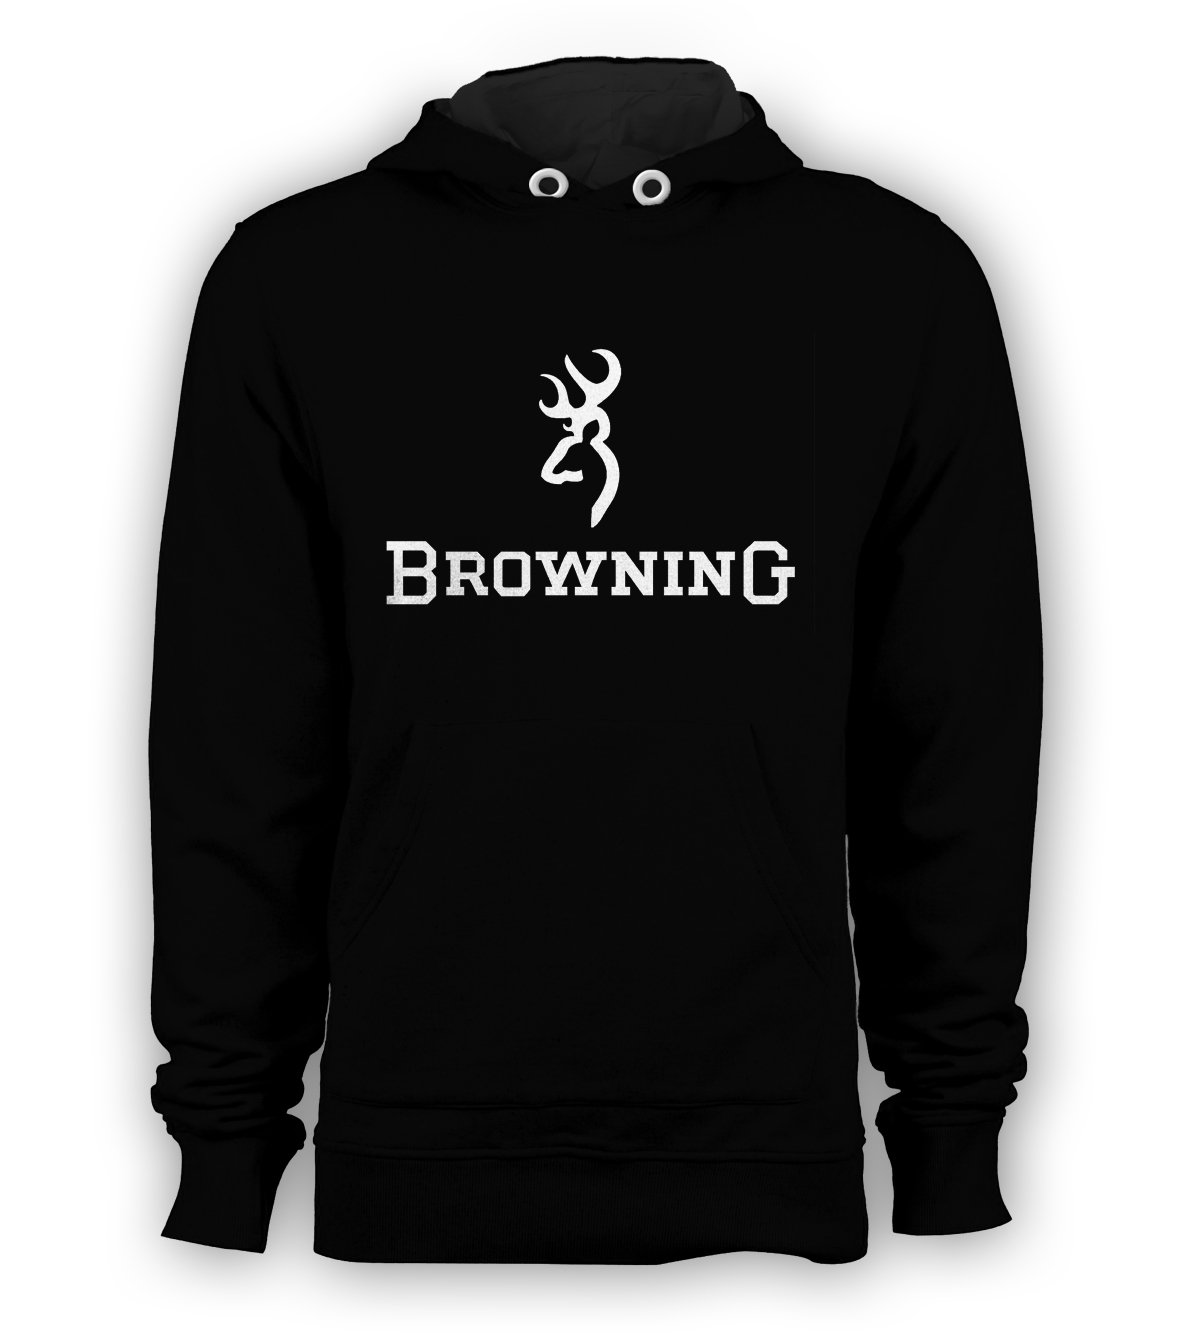 Browning Firearms Rifles Gun Pullover Hoodie Men Sweatshirts Size S to 3XL New Black